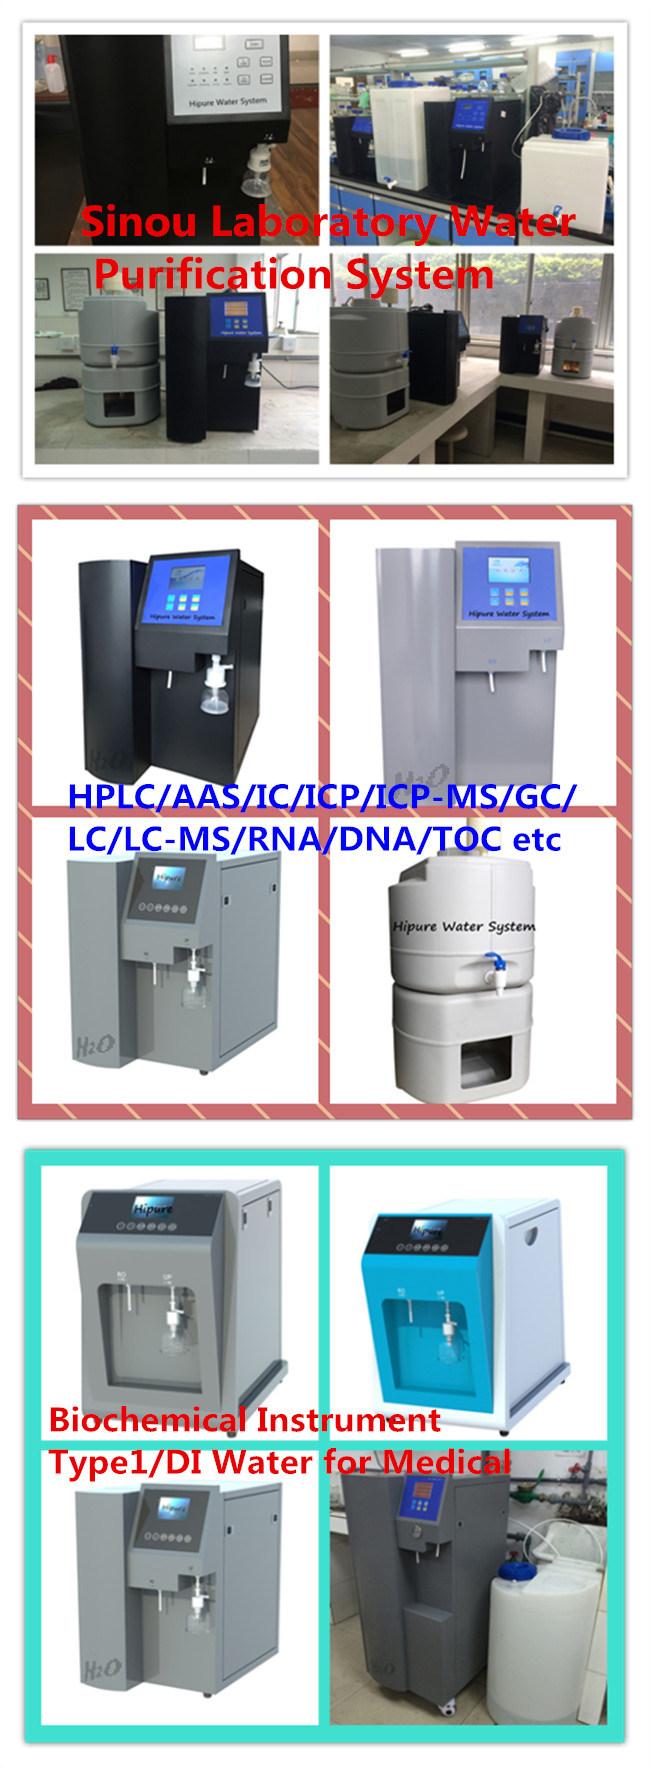 Biochemical Type 1 Deionized Di Water Instrument for Lab 75